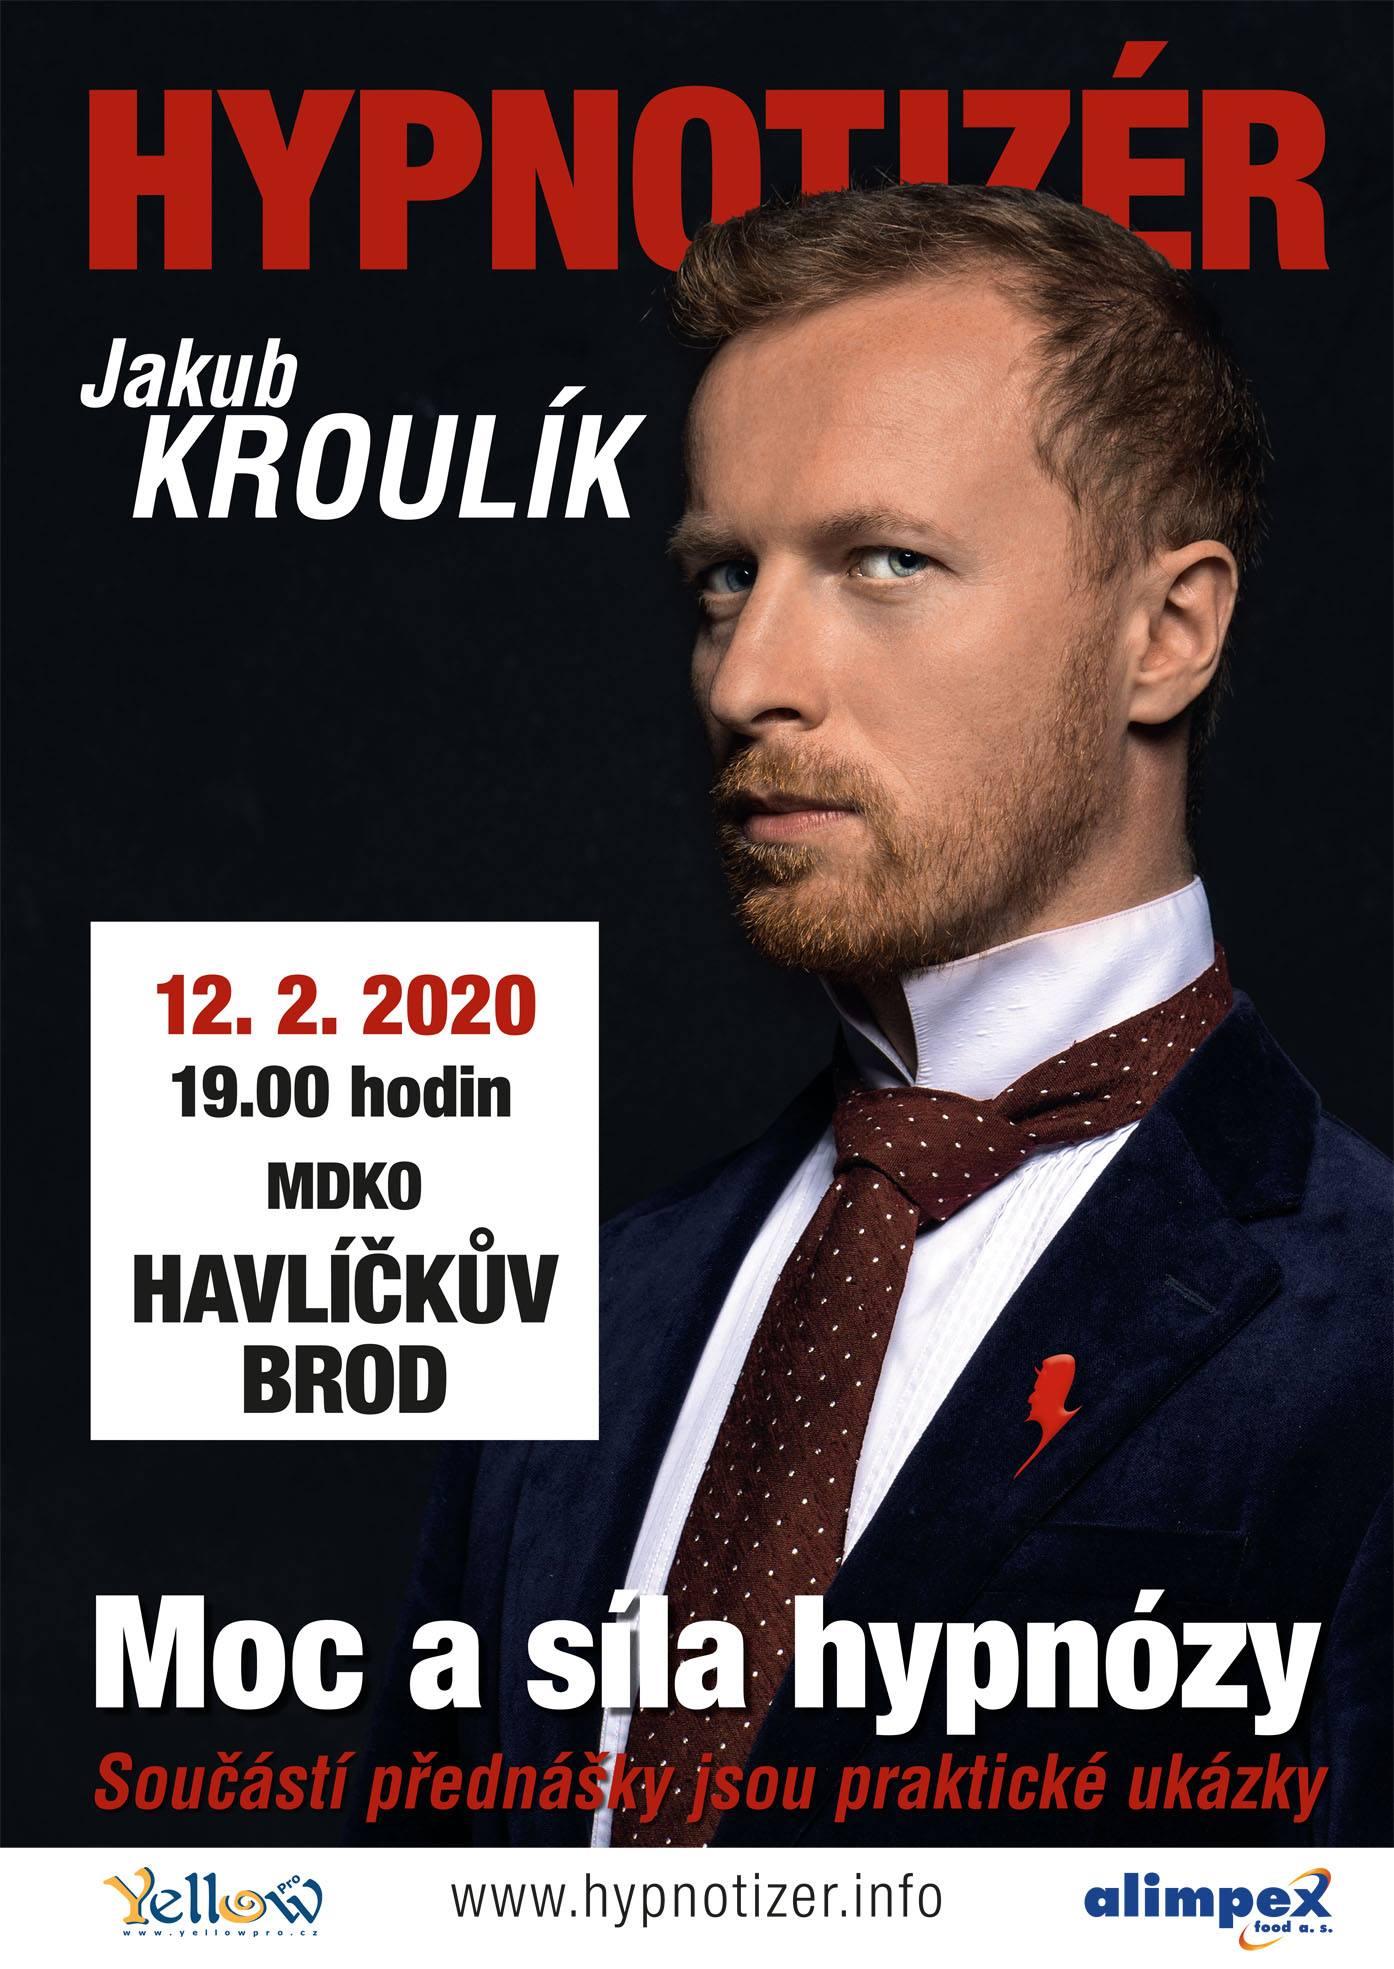 Hypnotizer Jakub Kroulik v Havlickove Brode